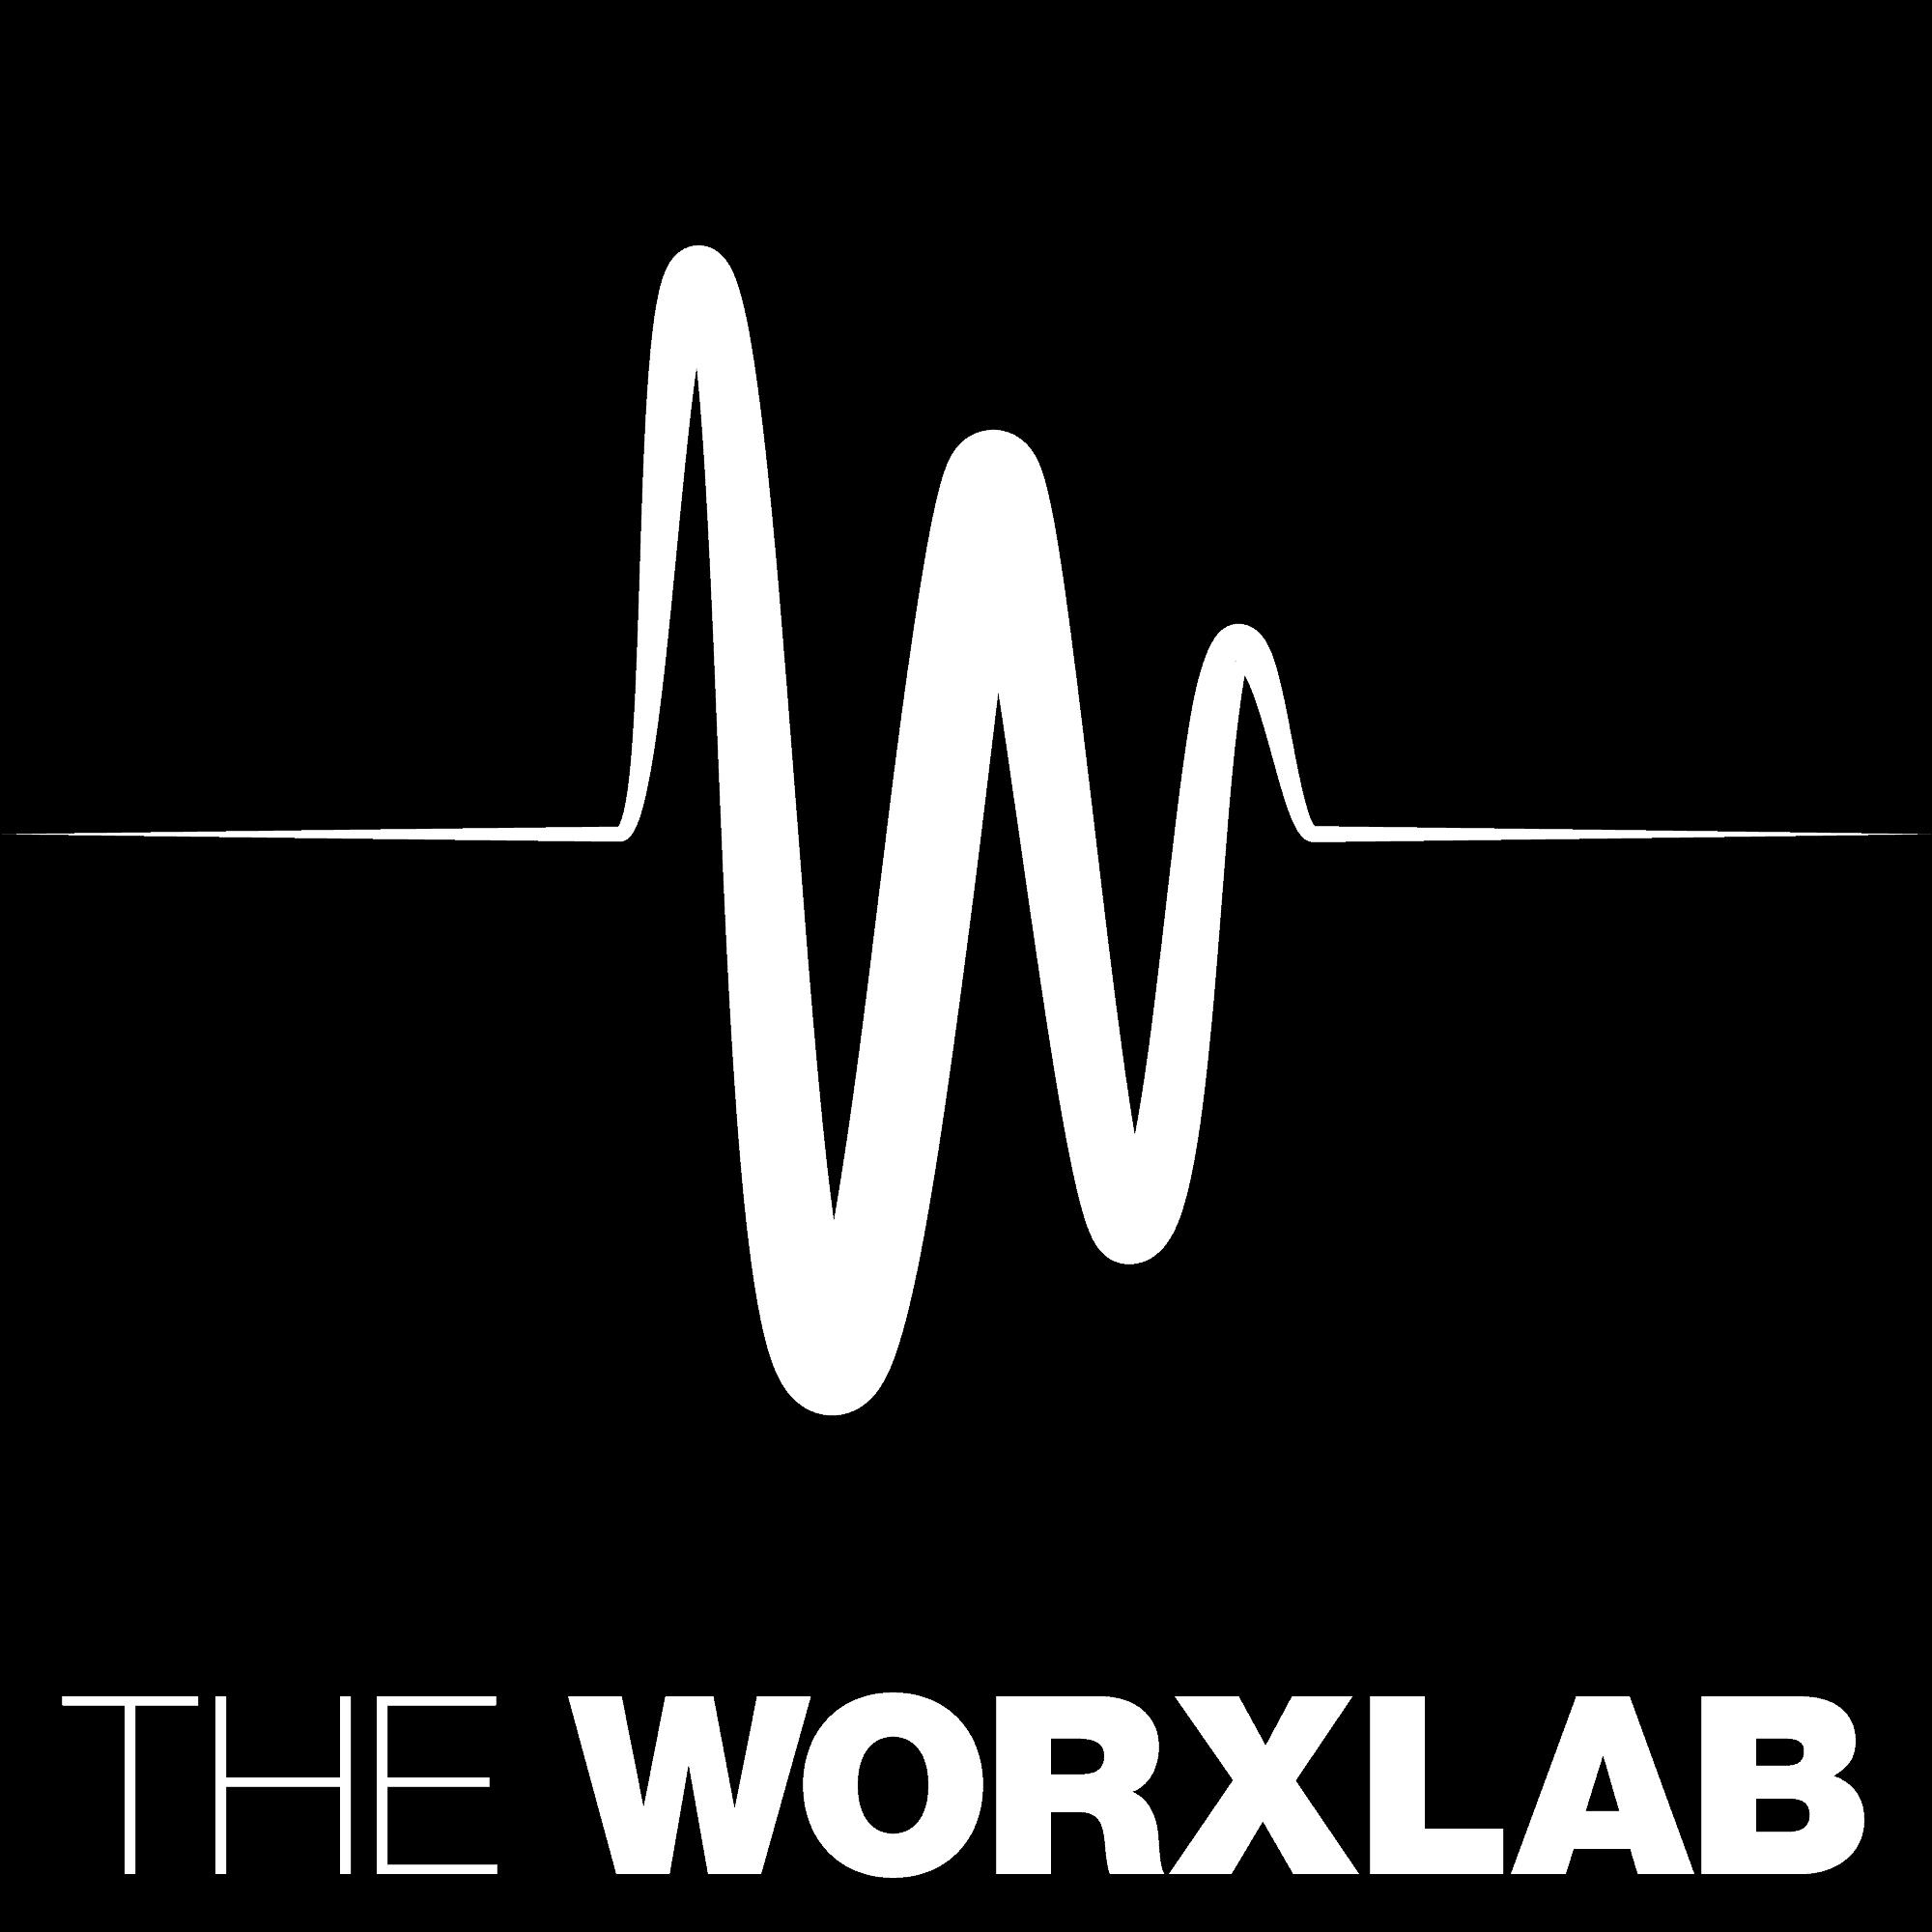 The Worxlab